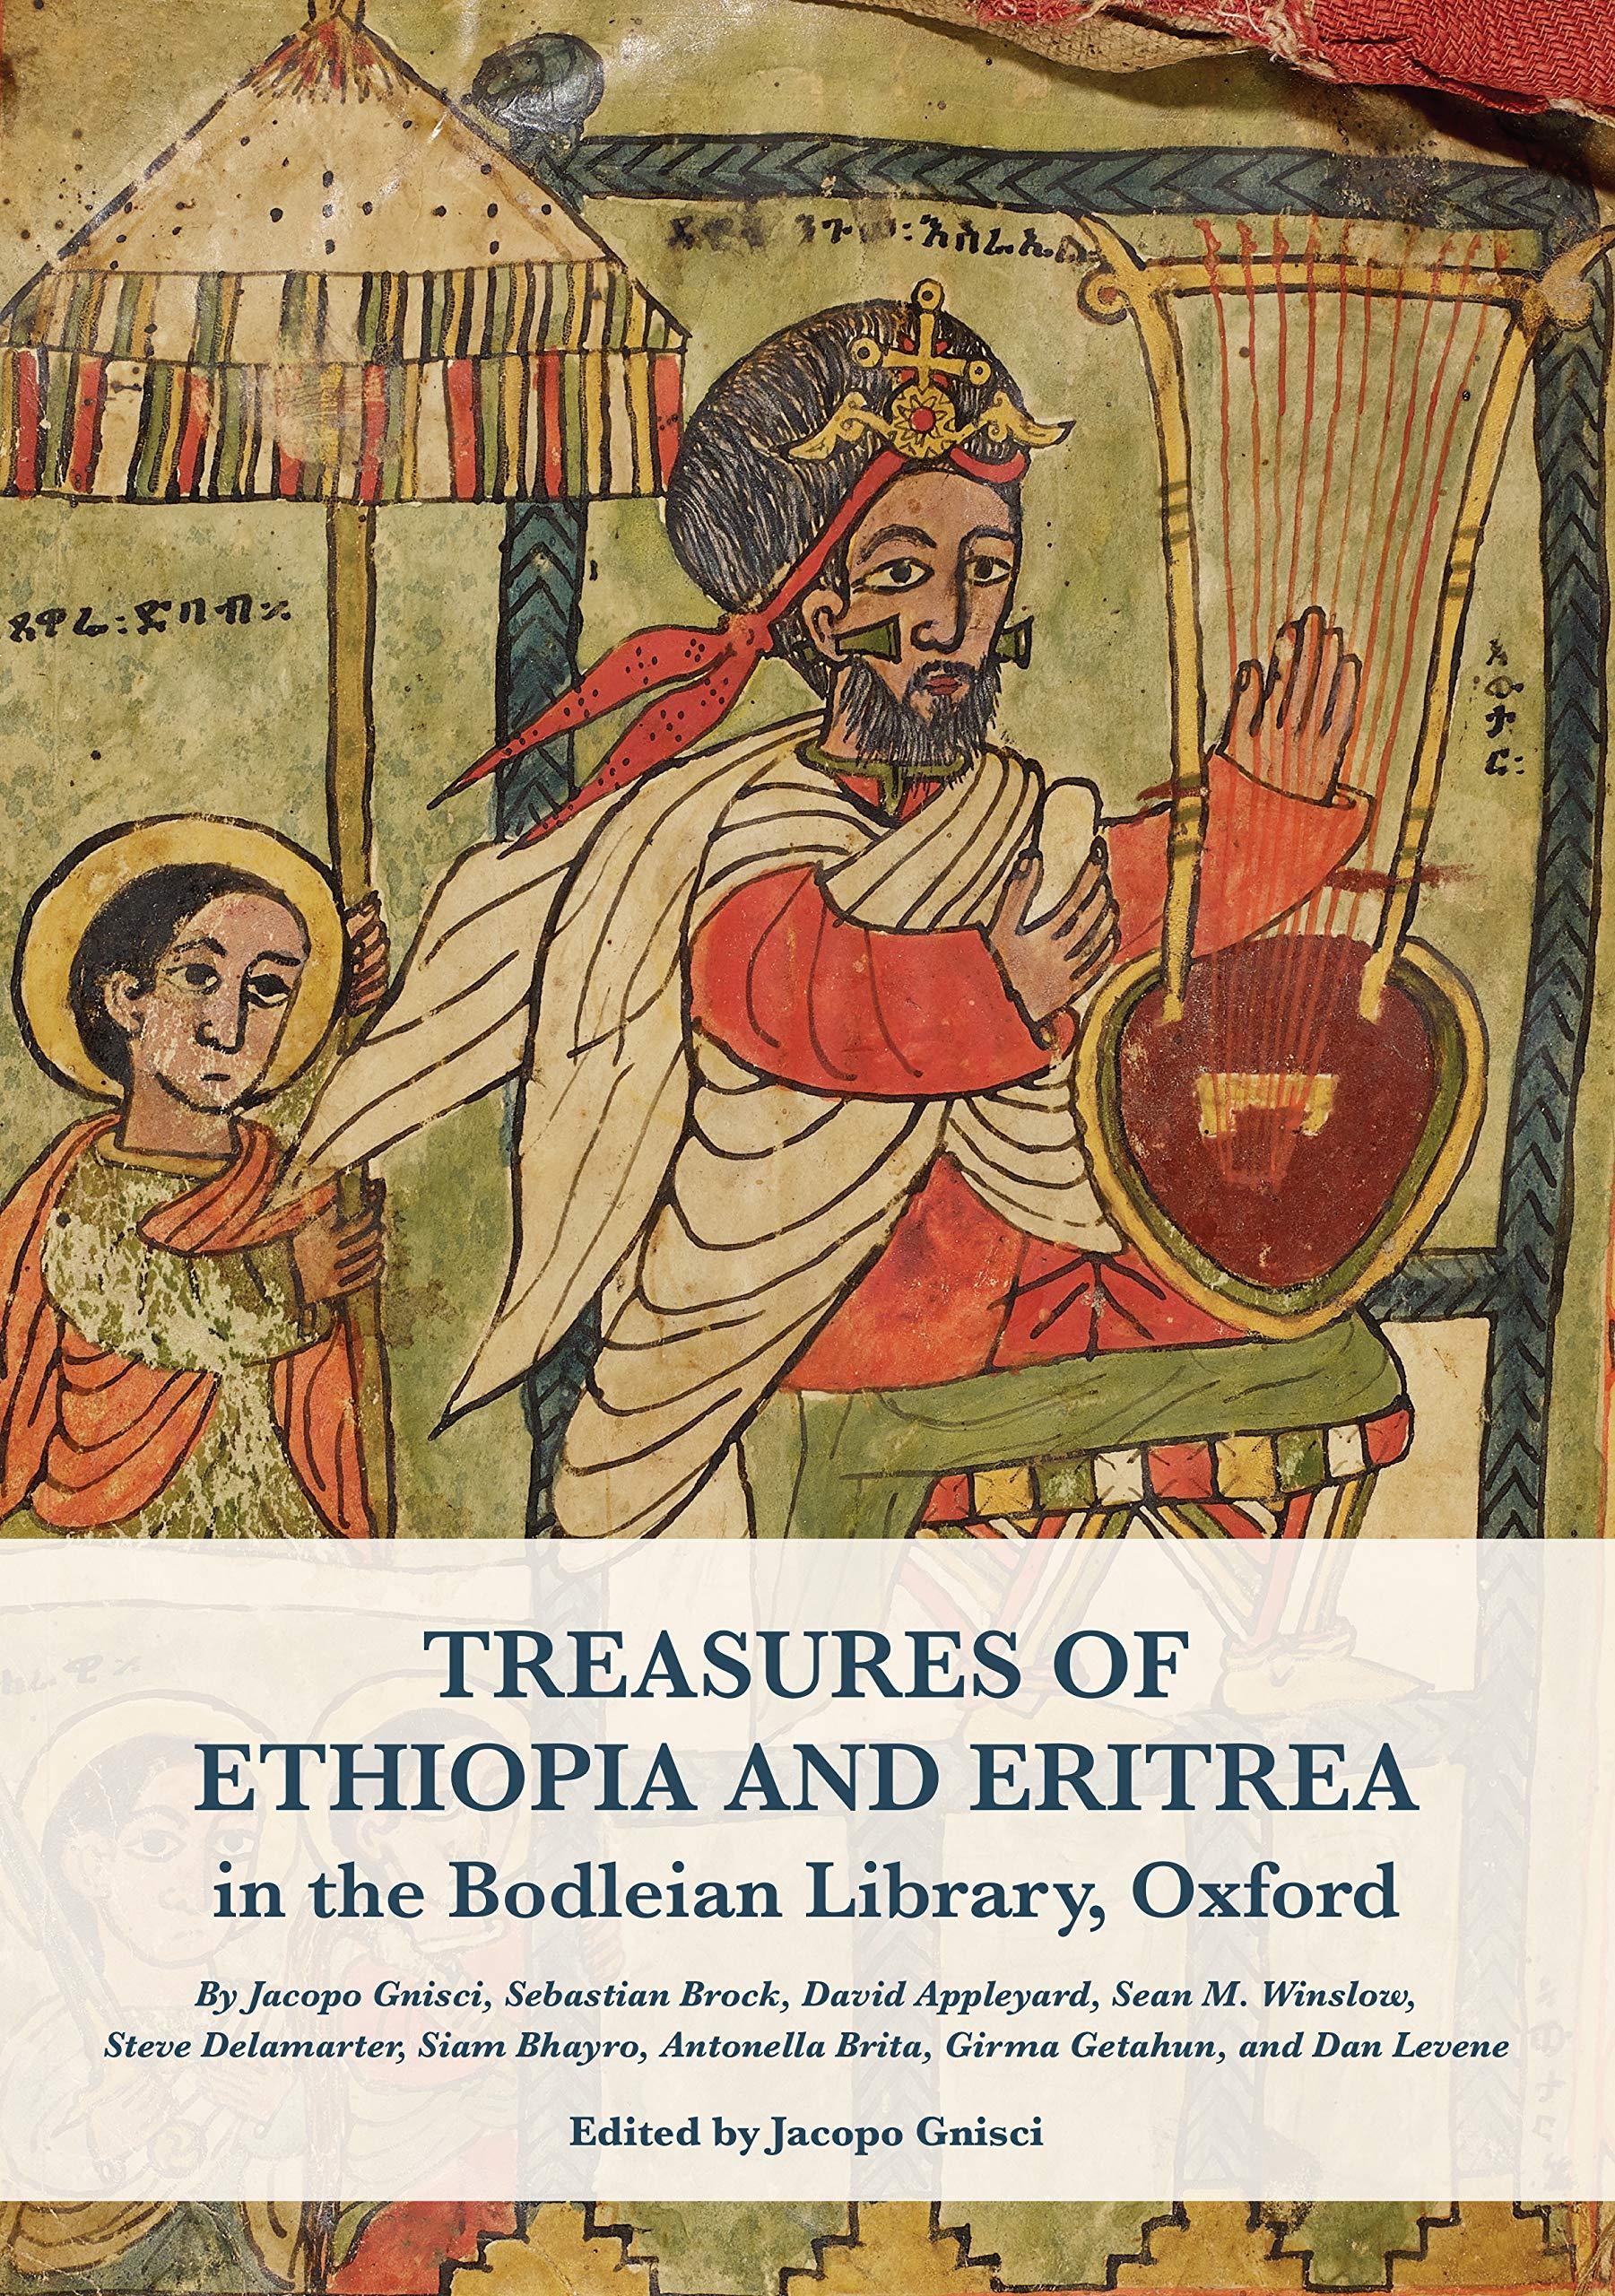 TREASURES OF ETHIOPIA AND ERITREA BOD PB